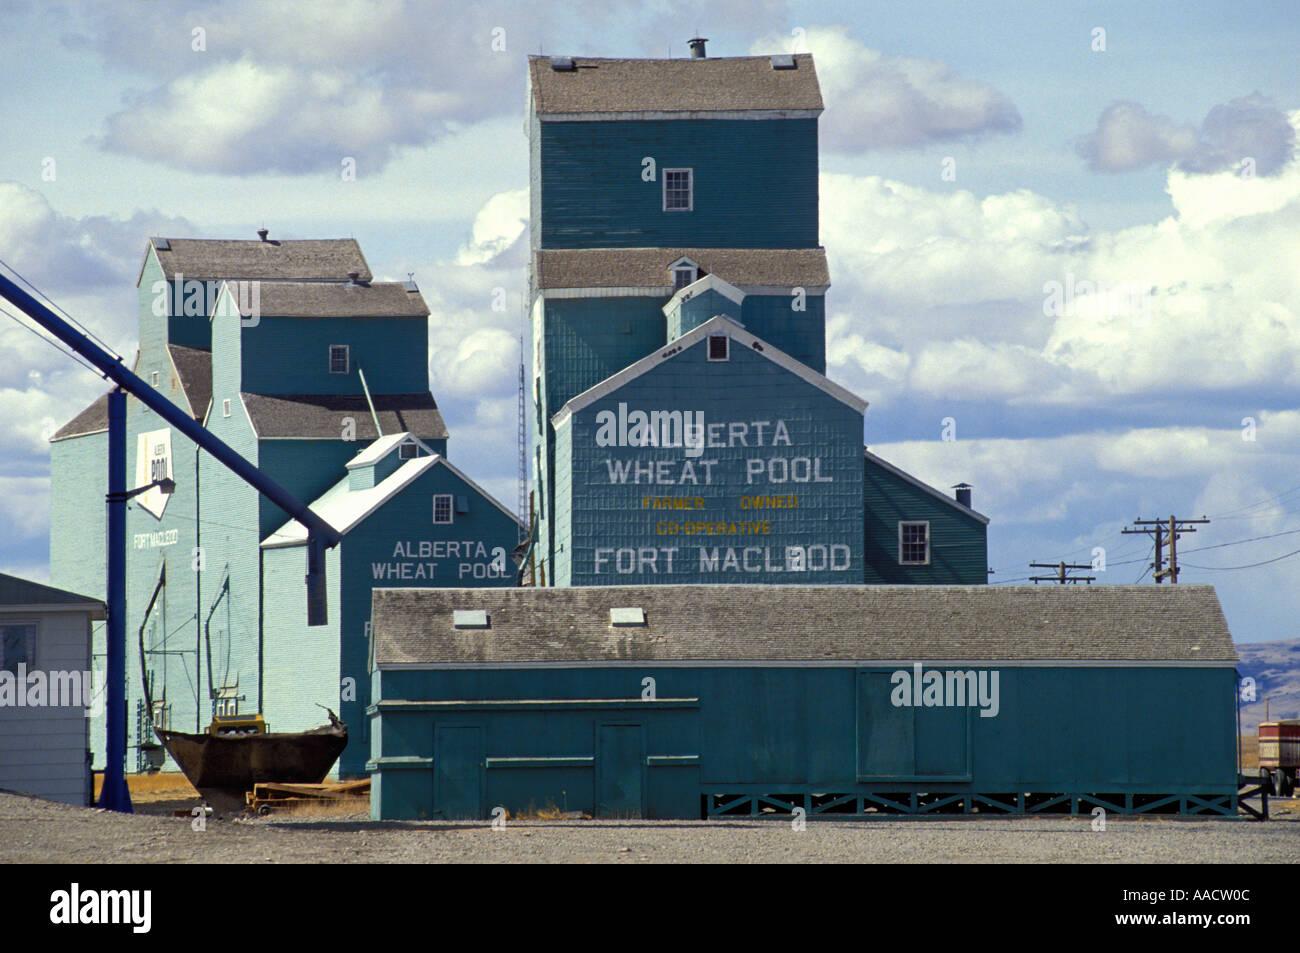 Alberta Wheat Pool Storage For Grain Harvest Near Pincher Creek In Stock Photo Royalty Free